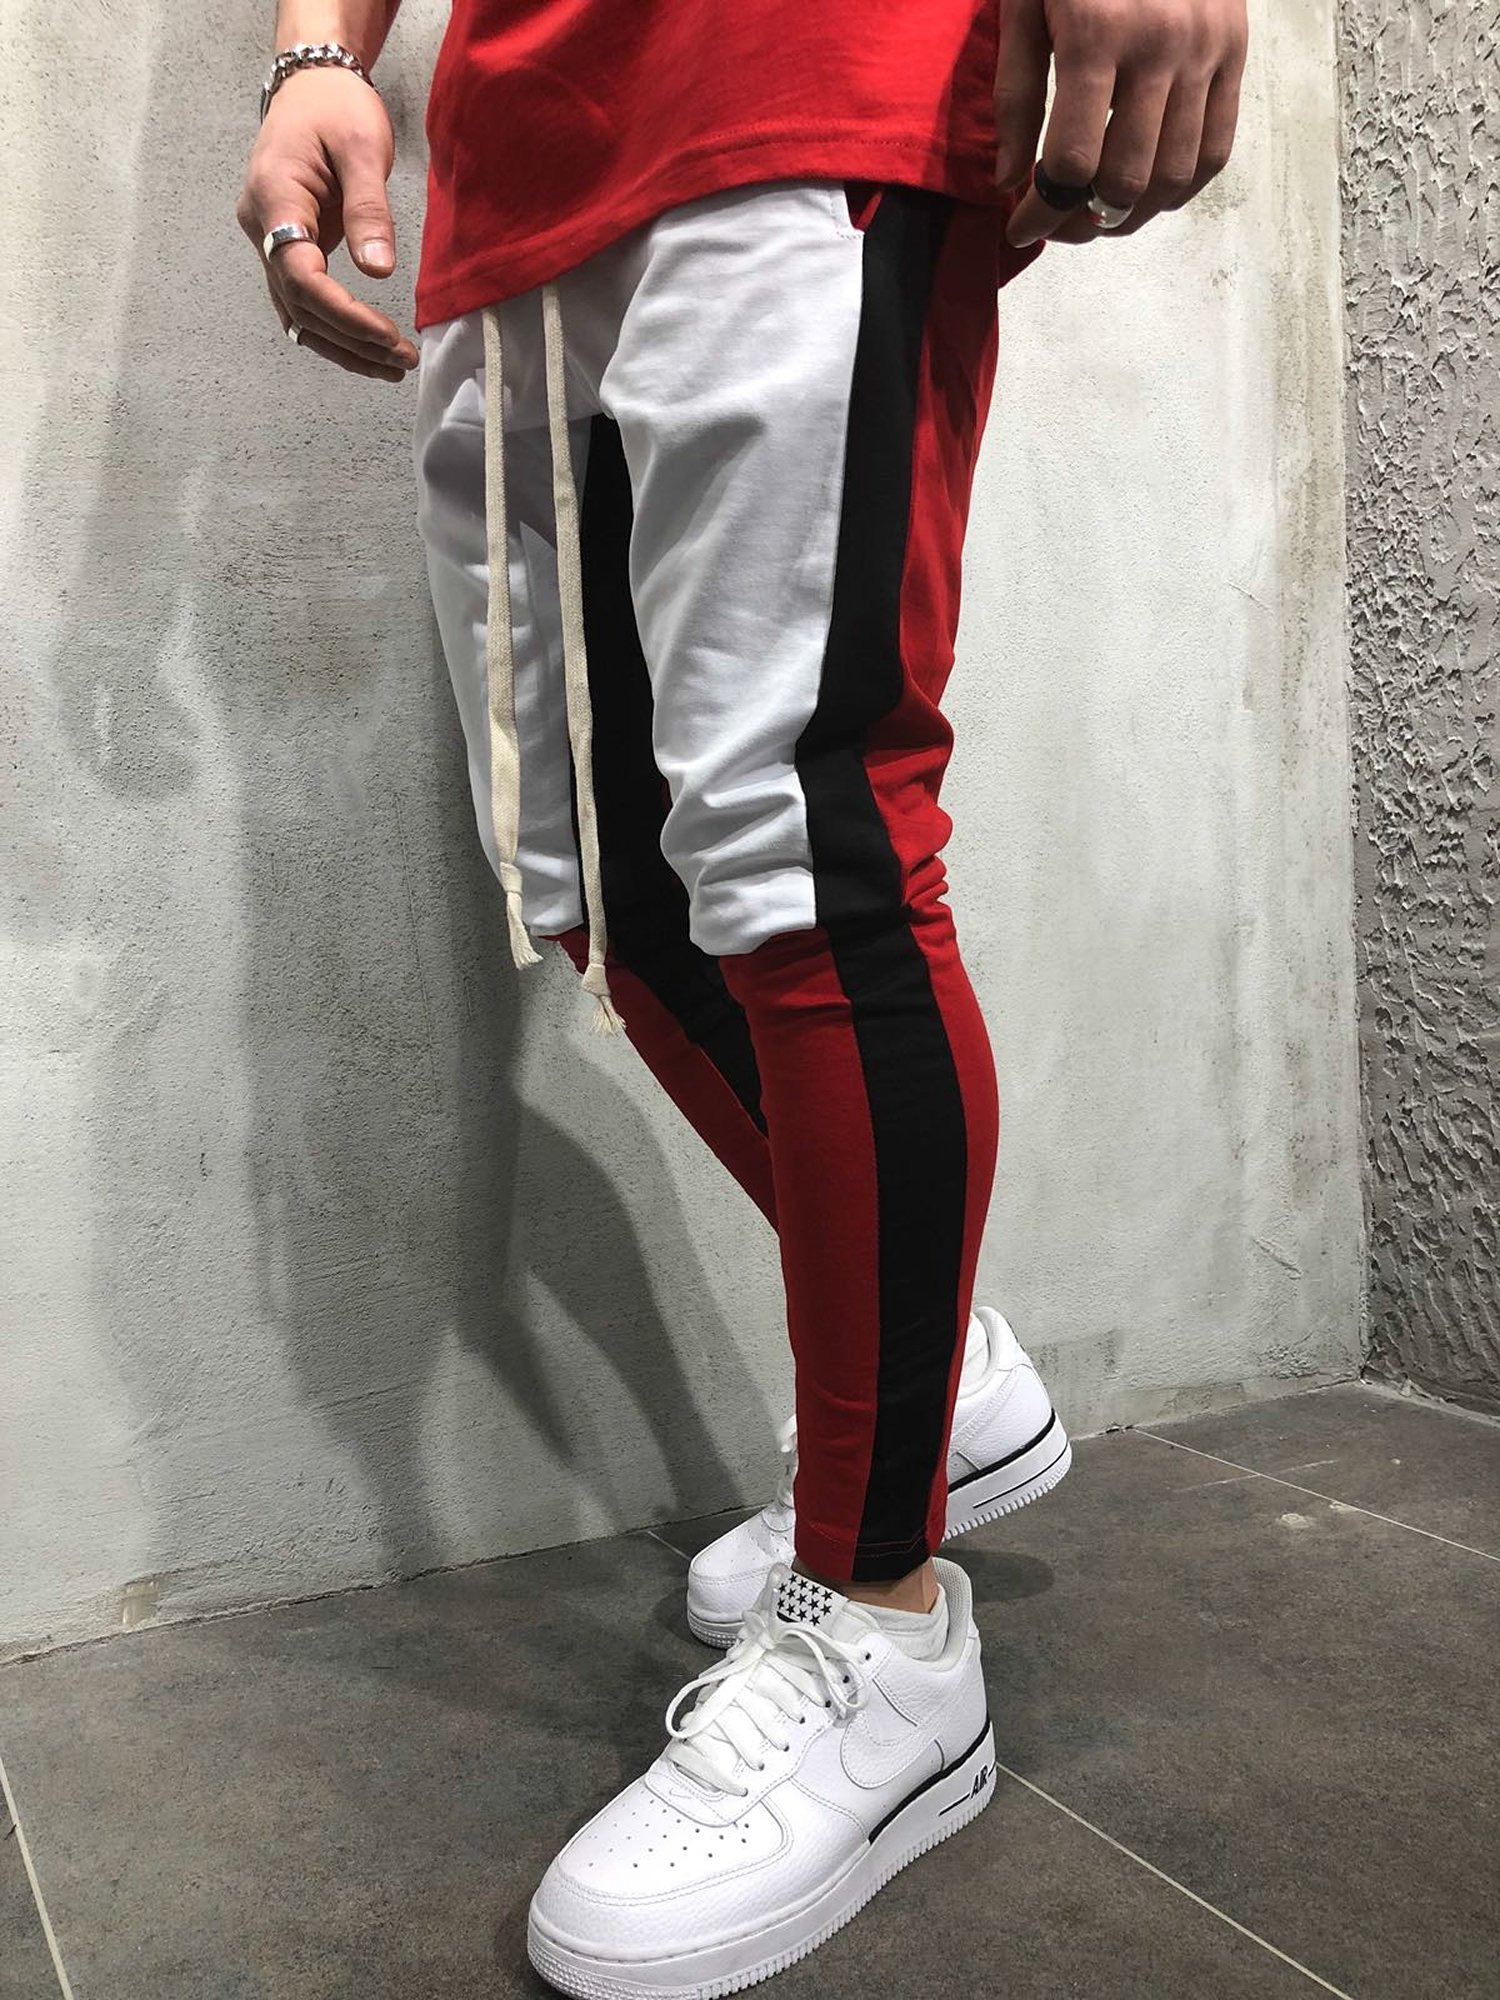 Men Slim Fit Casual Tricolor Sweatpants  MST10 – Online Shopping in ... 47c8c1ada2